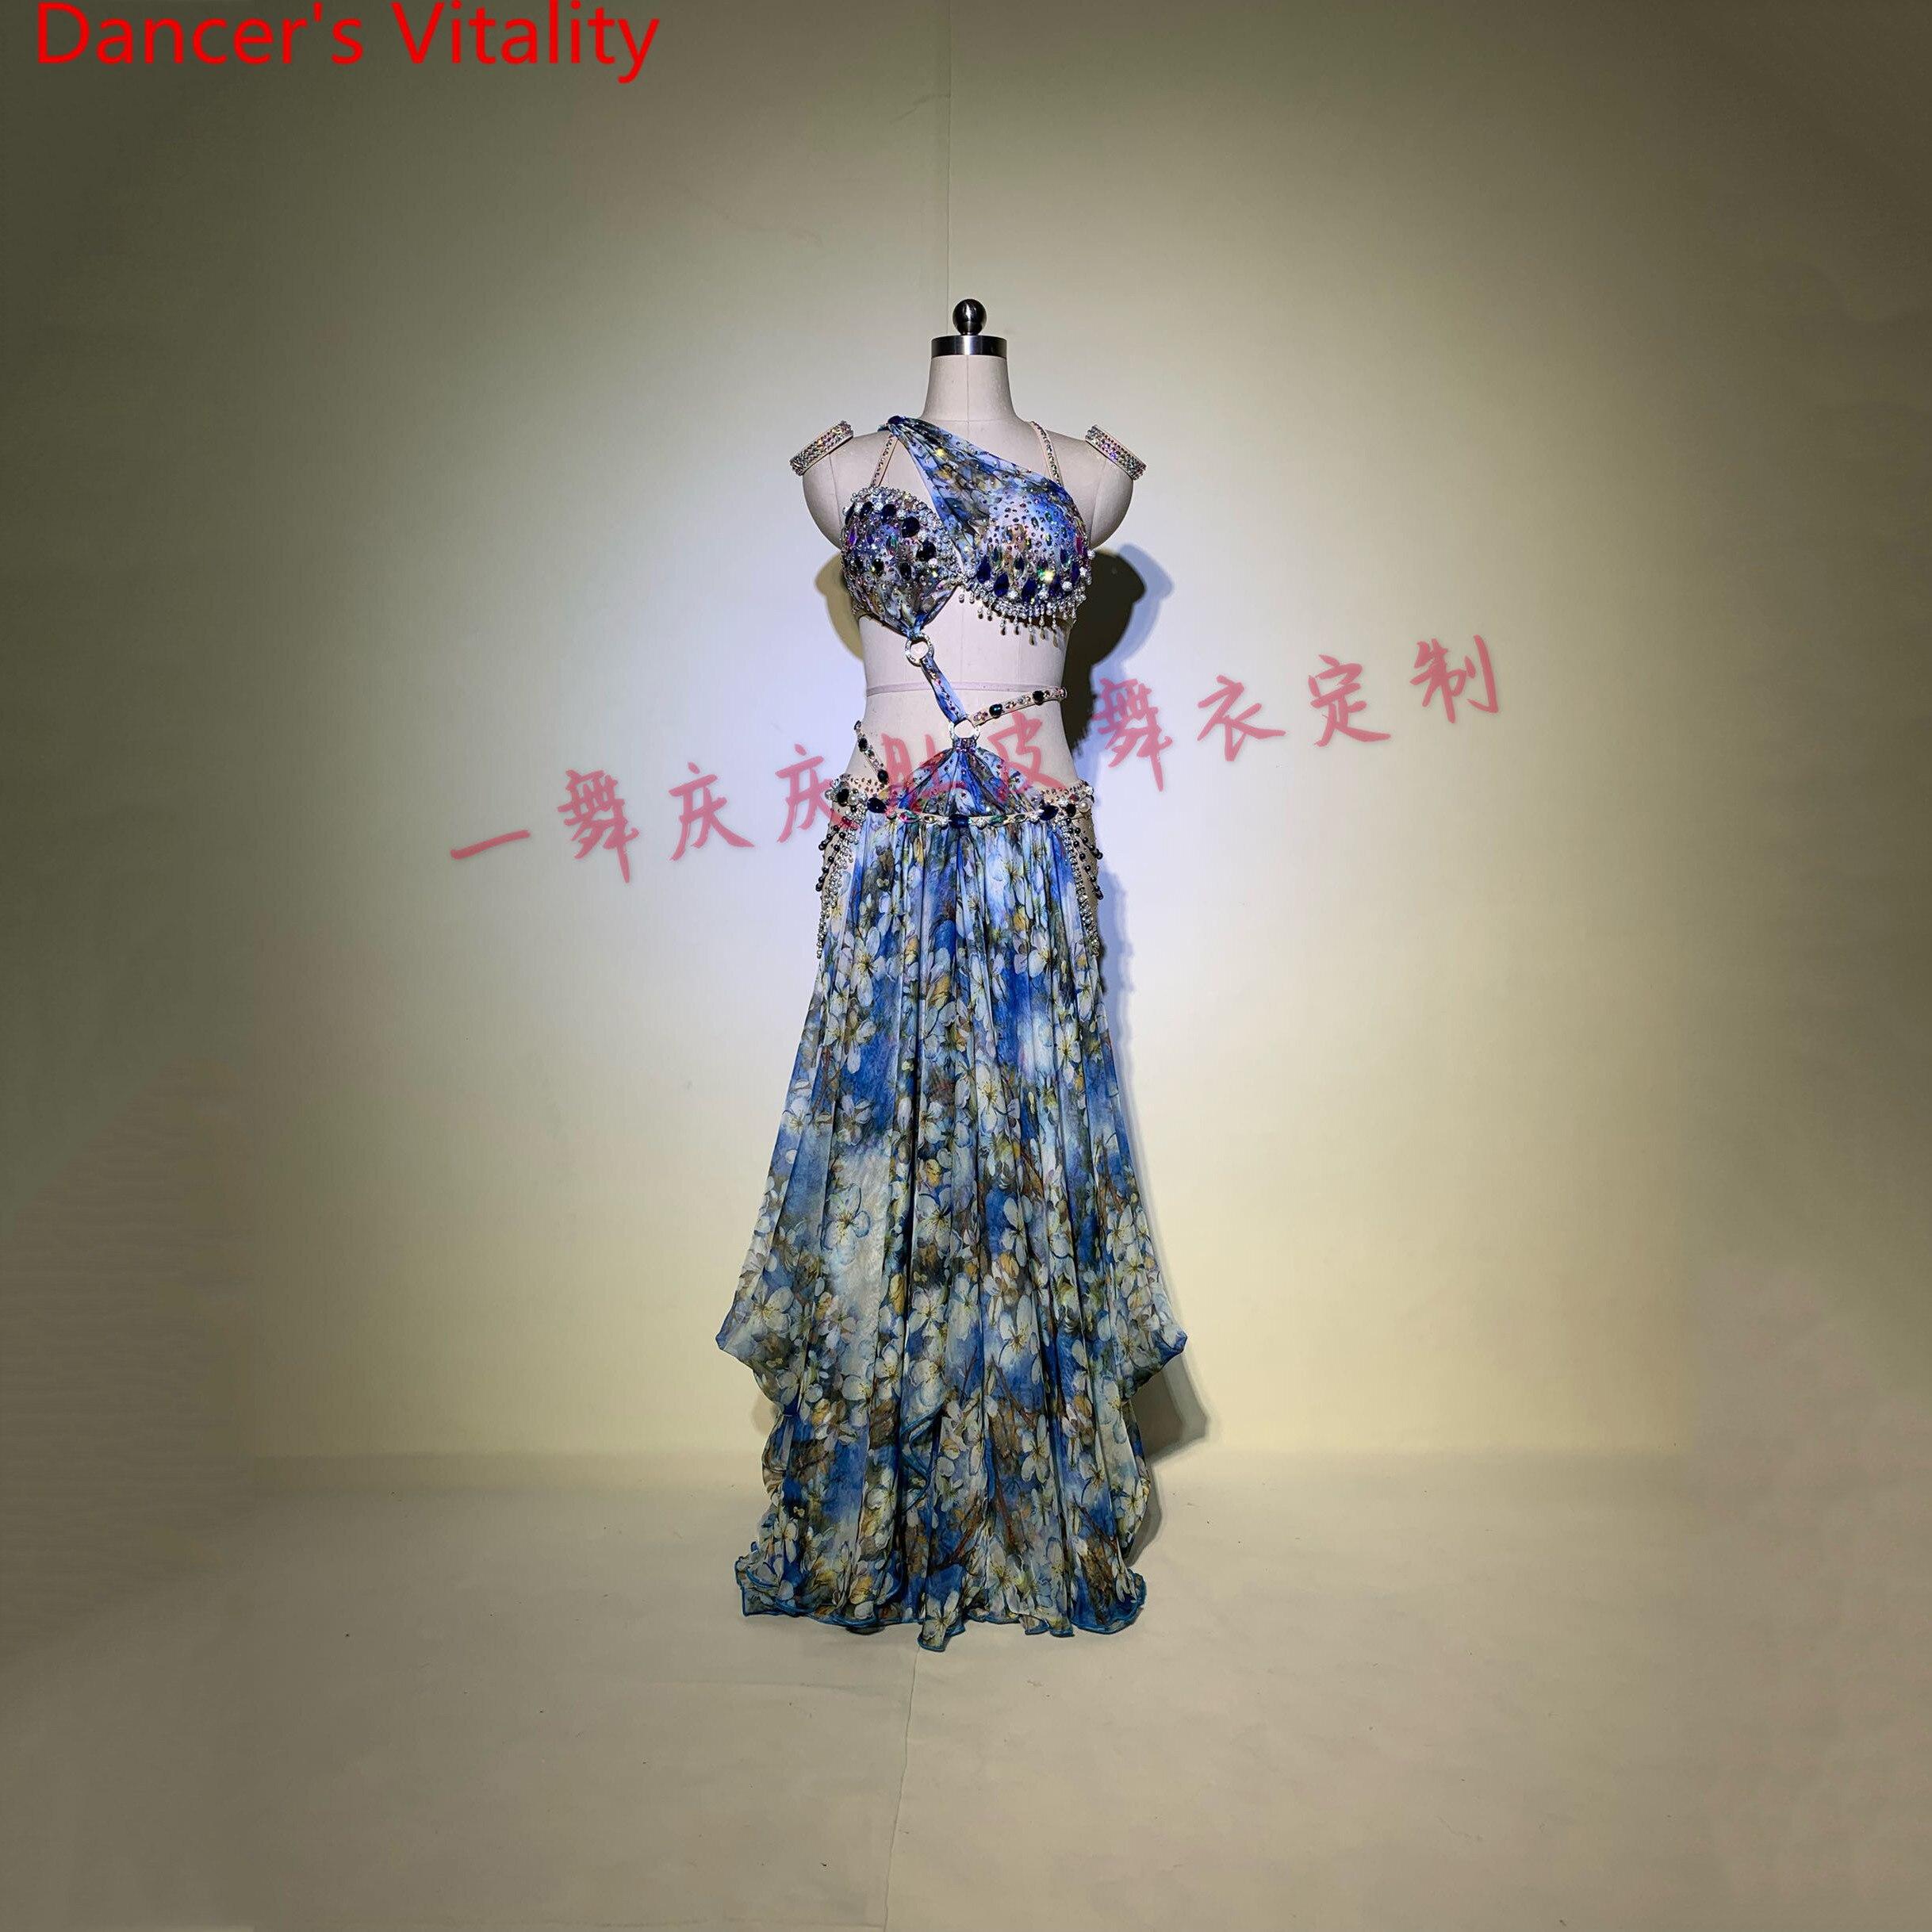 Customized Lady Belly Dance Ribbon Bra Glitter Diamond Skirt Women Oriental Indian Drum Dance Group Competition Stage Wear Set